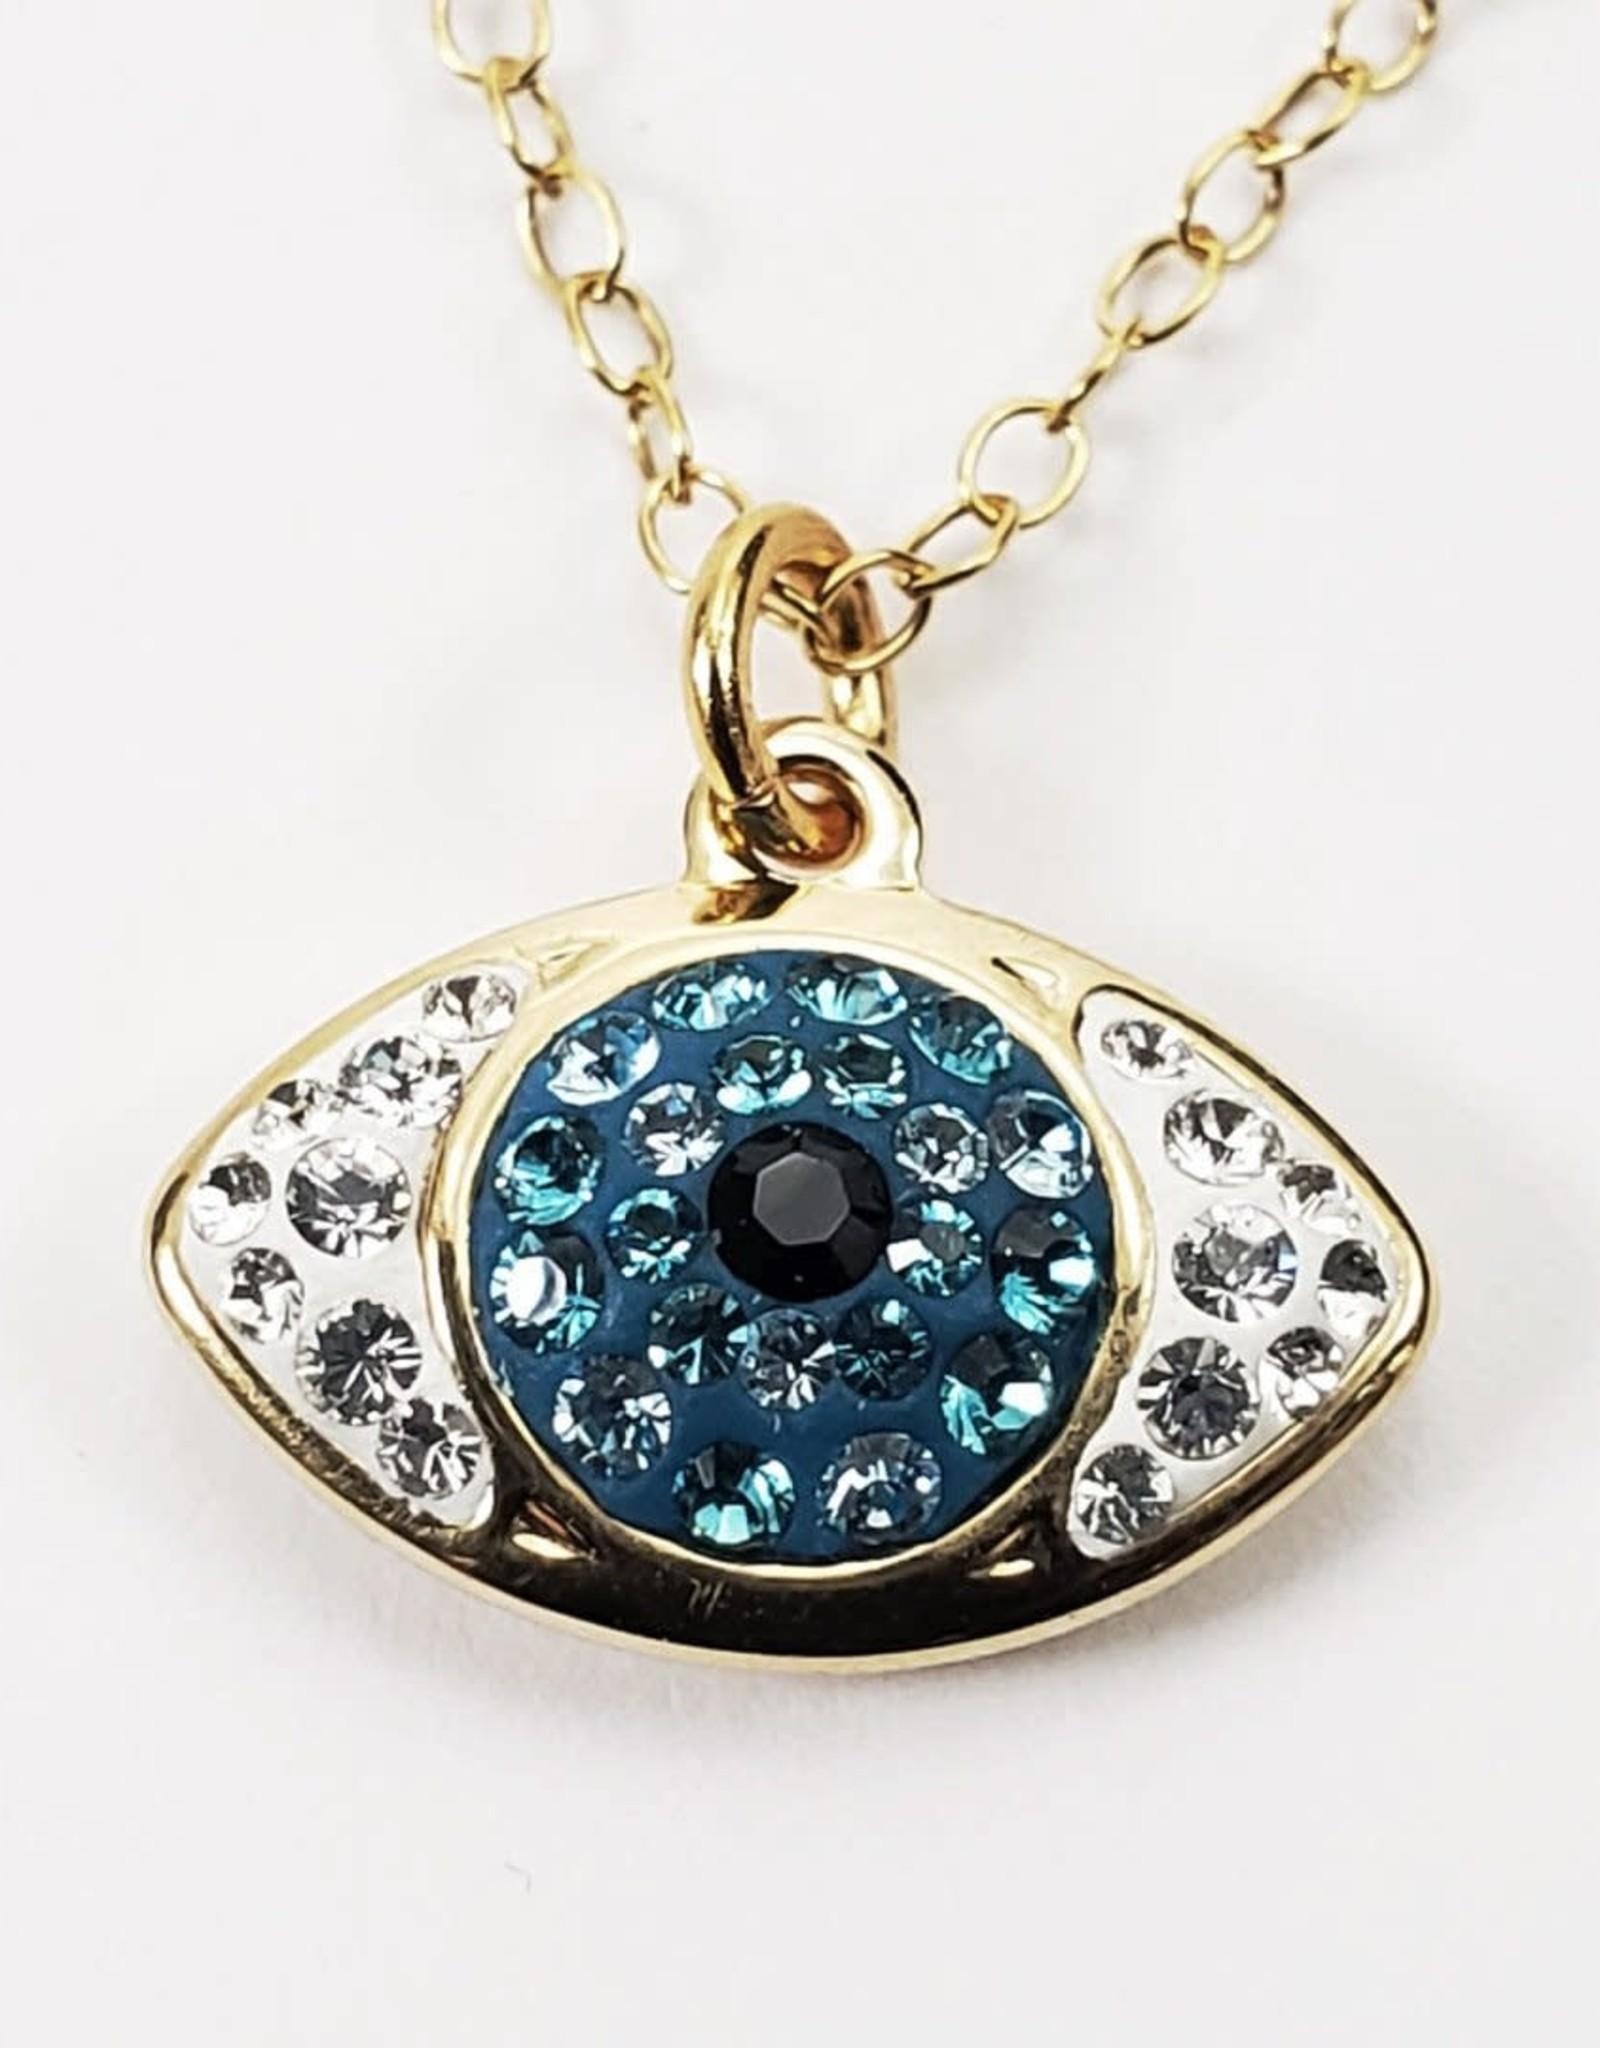 Dazzle Eye Necklace